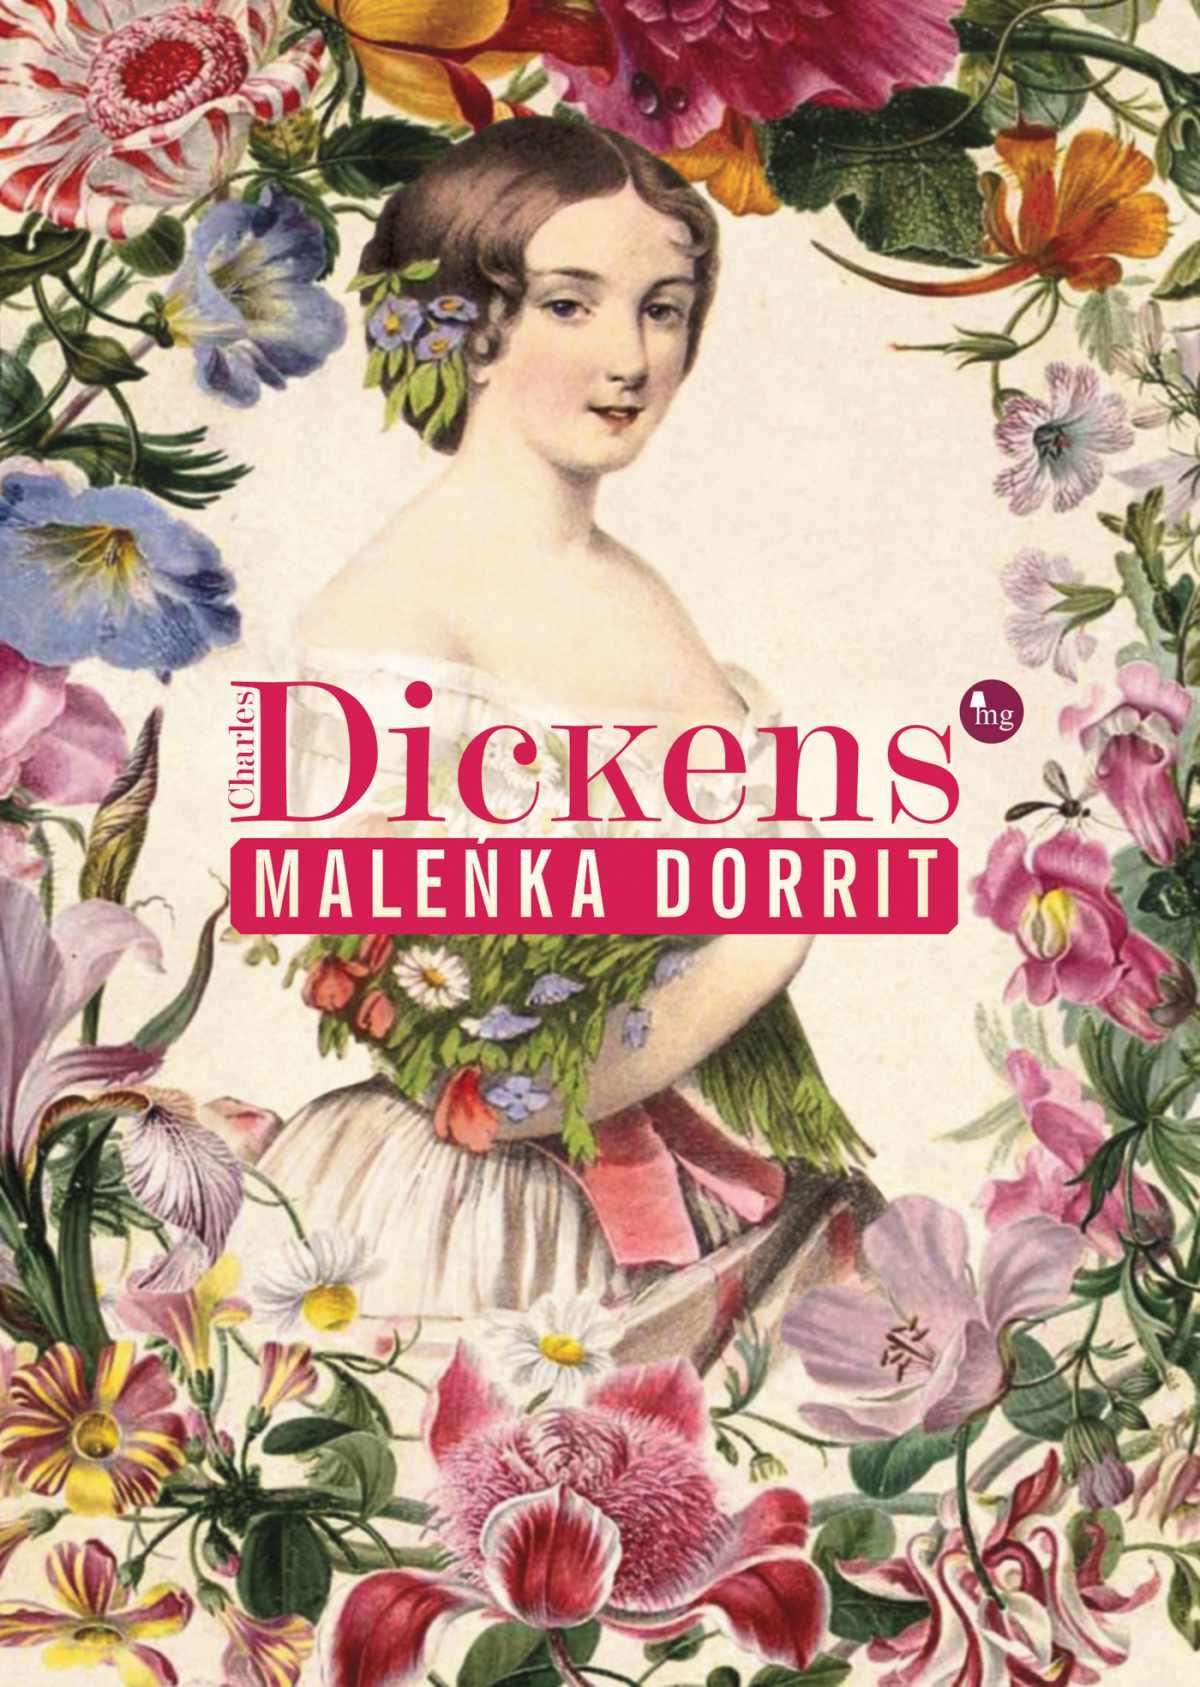 Maleńka Dorrit - Ebook (Książka na Kindle) do pobrania w formacie MOBI